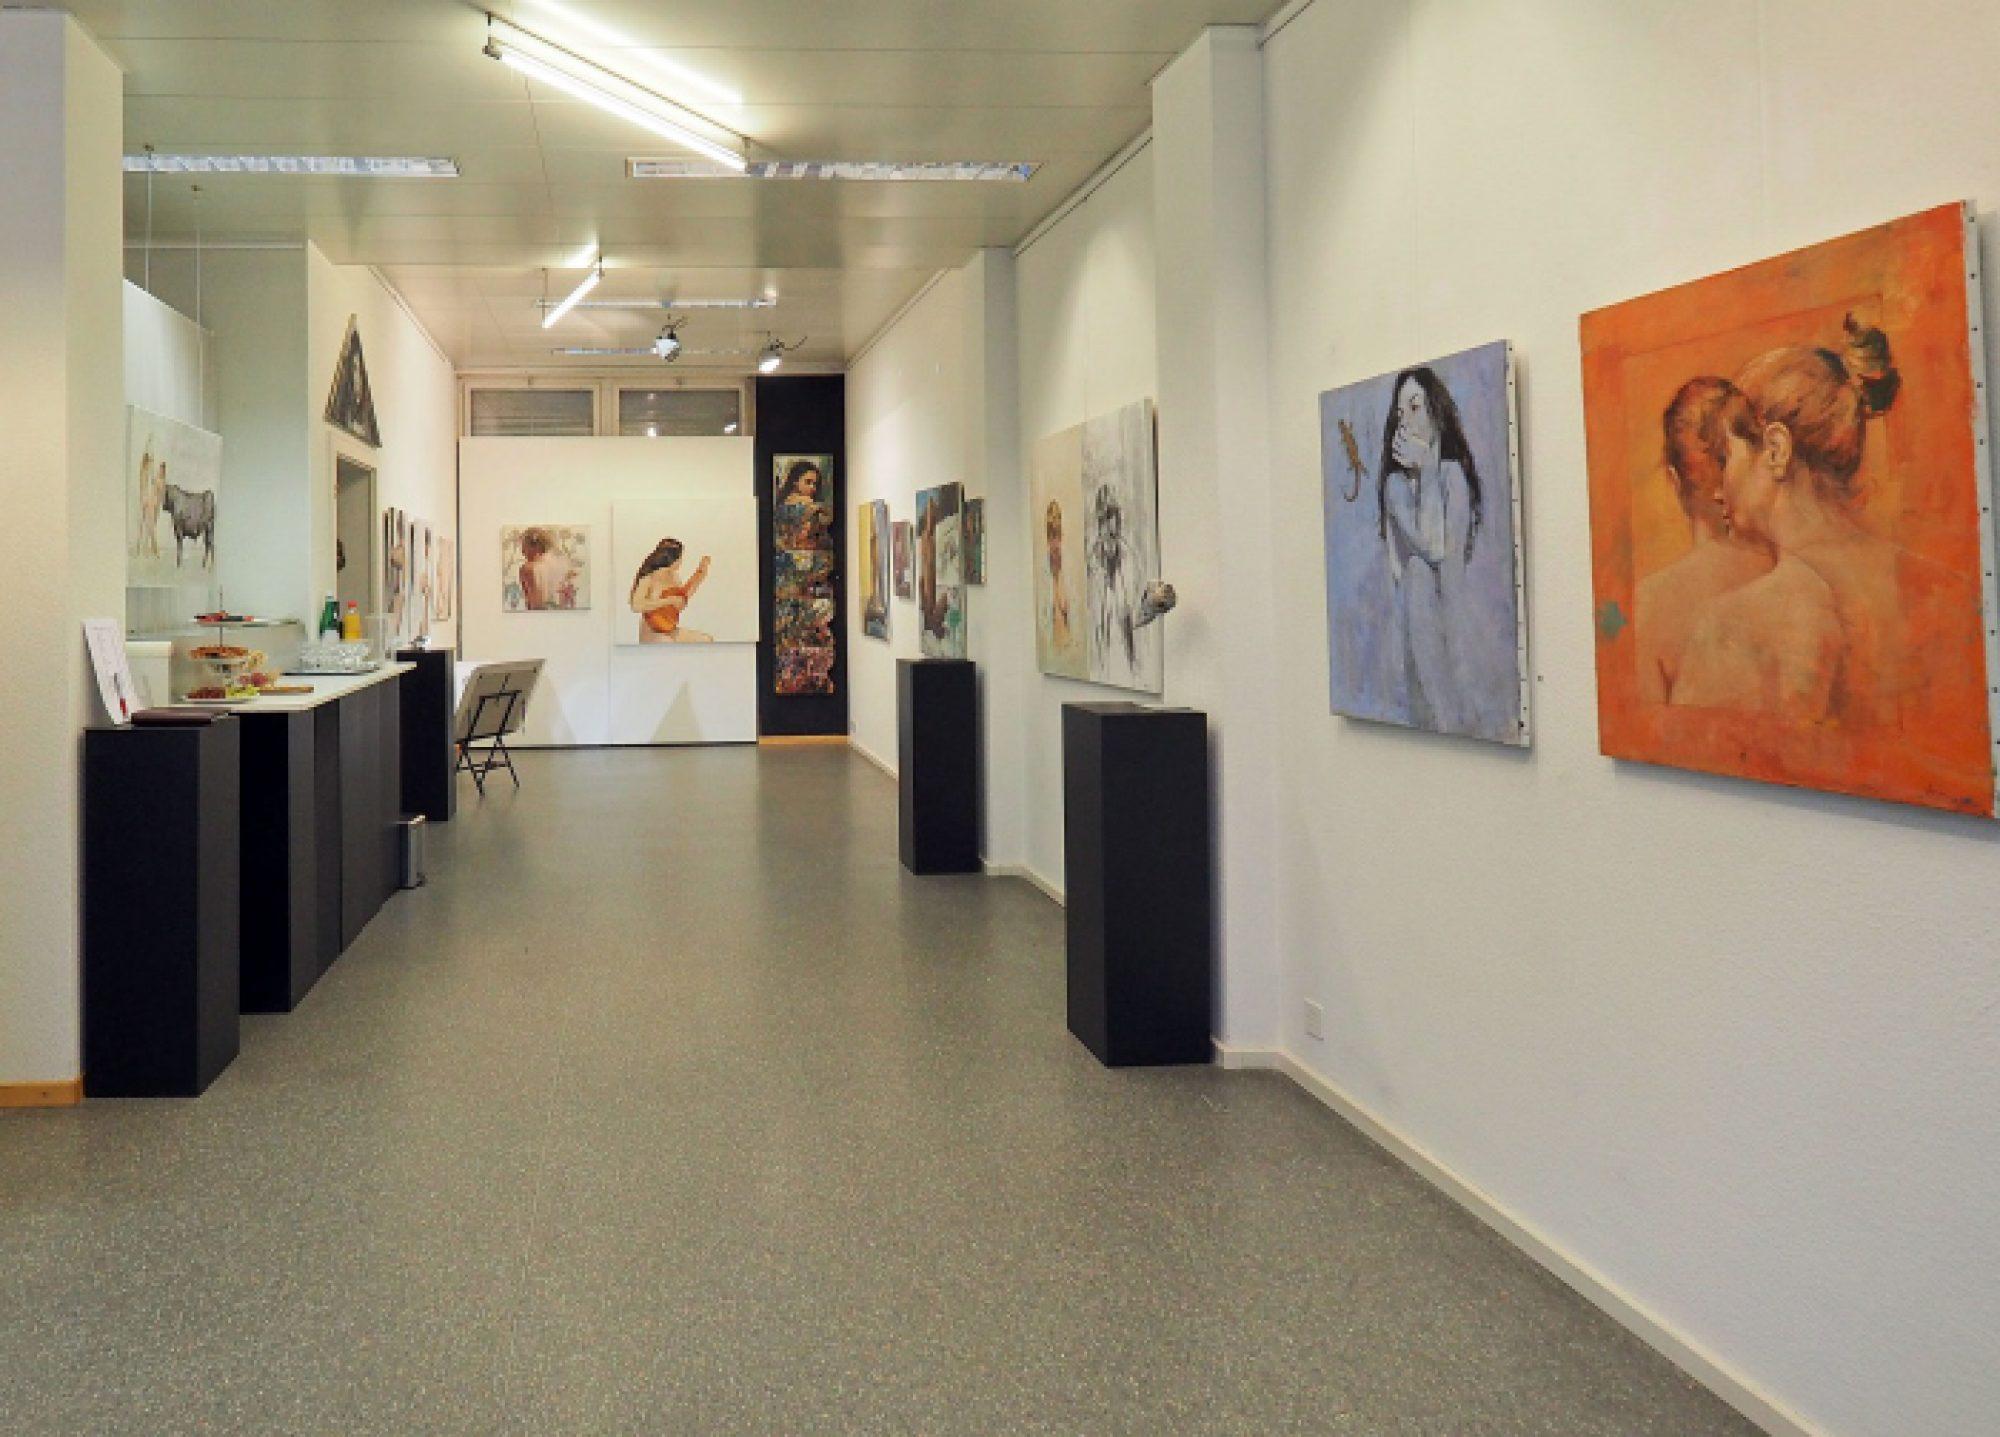 Keller Galerie CH-8001 Zürich (since 1981)